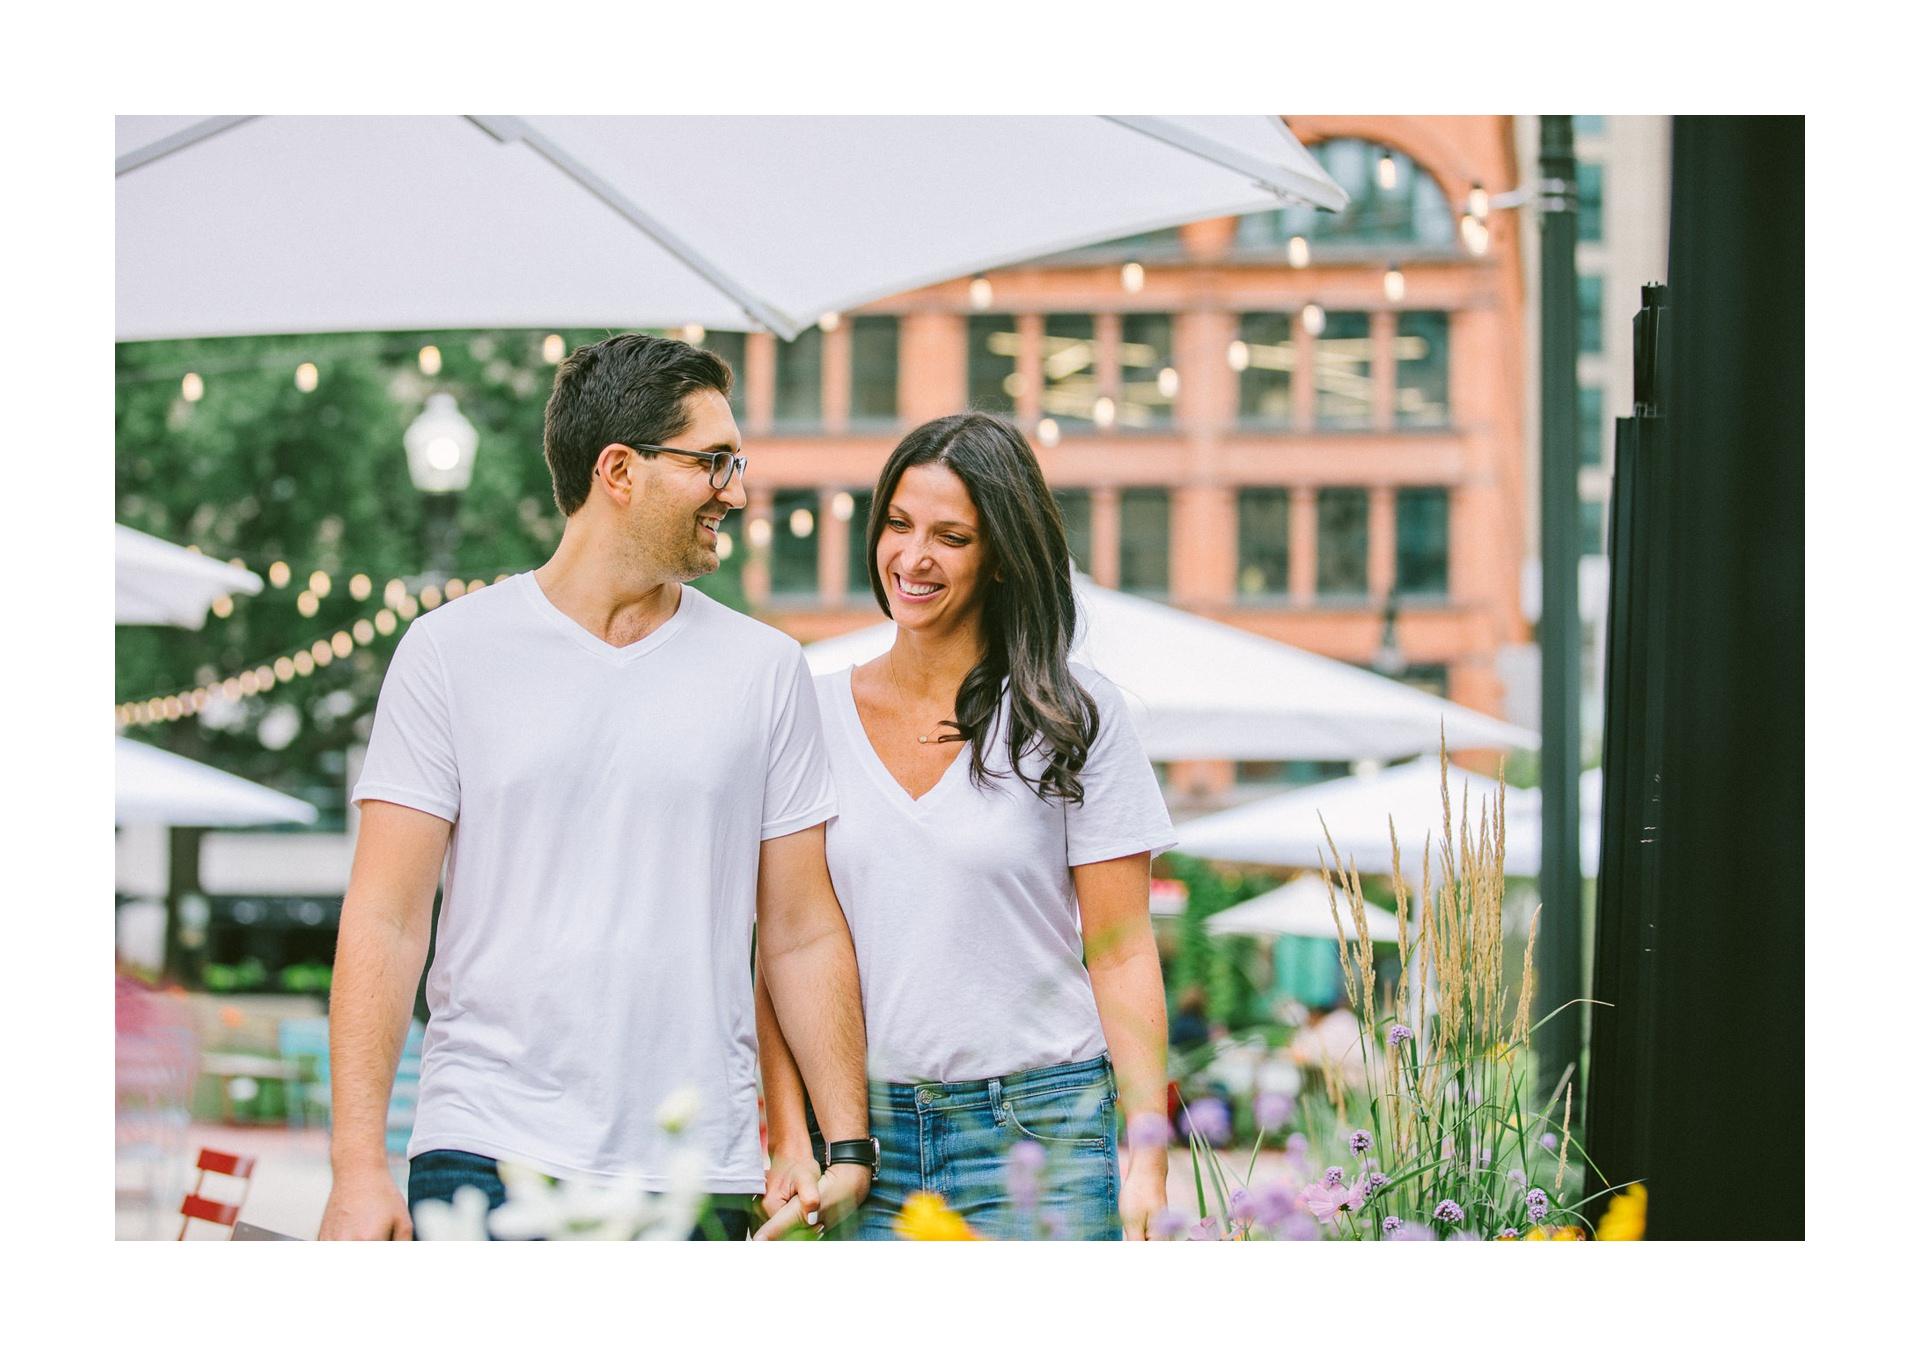 Detriot Engagement and Wedding Photographer 5.jpg